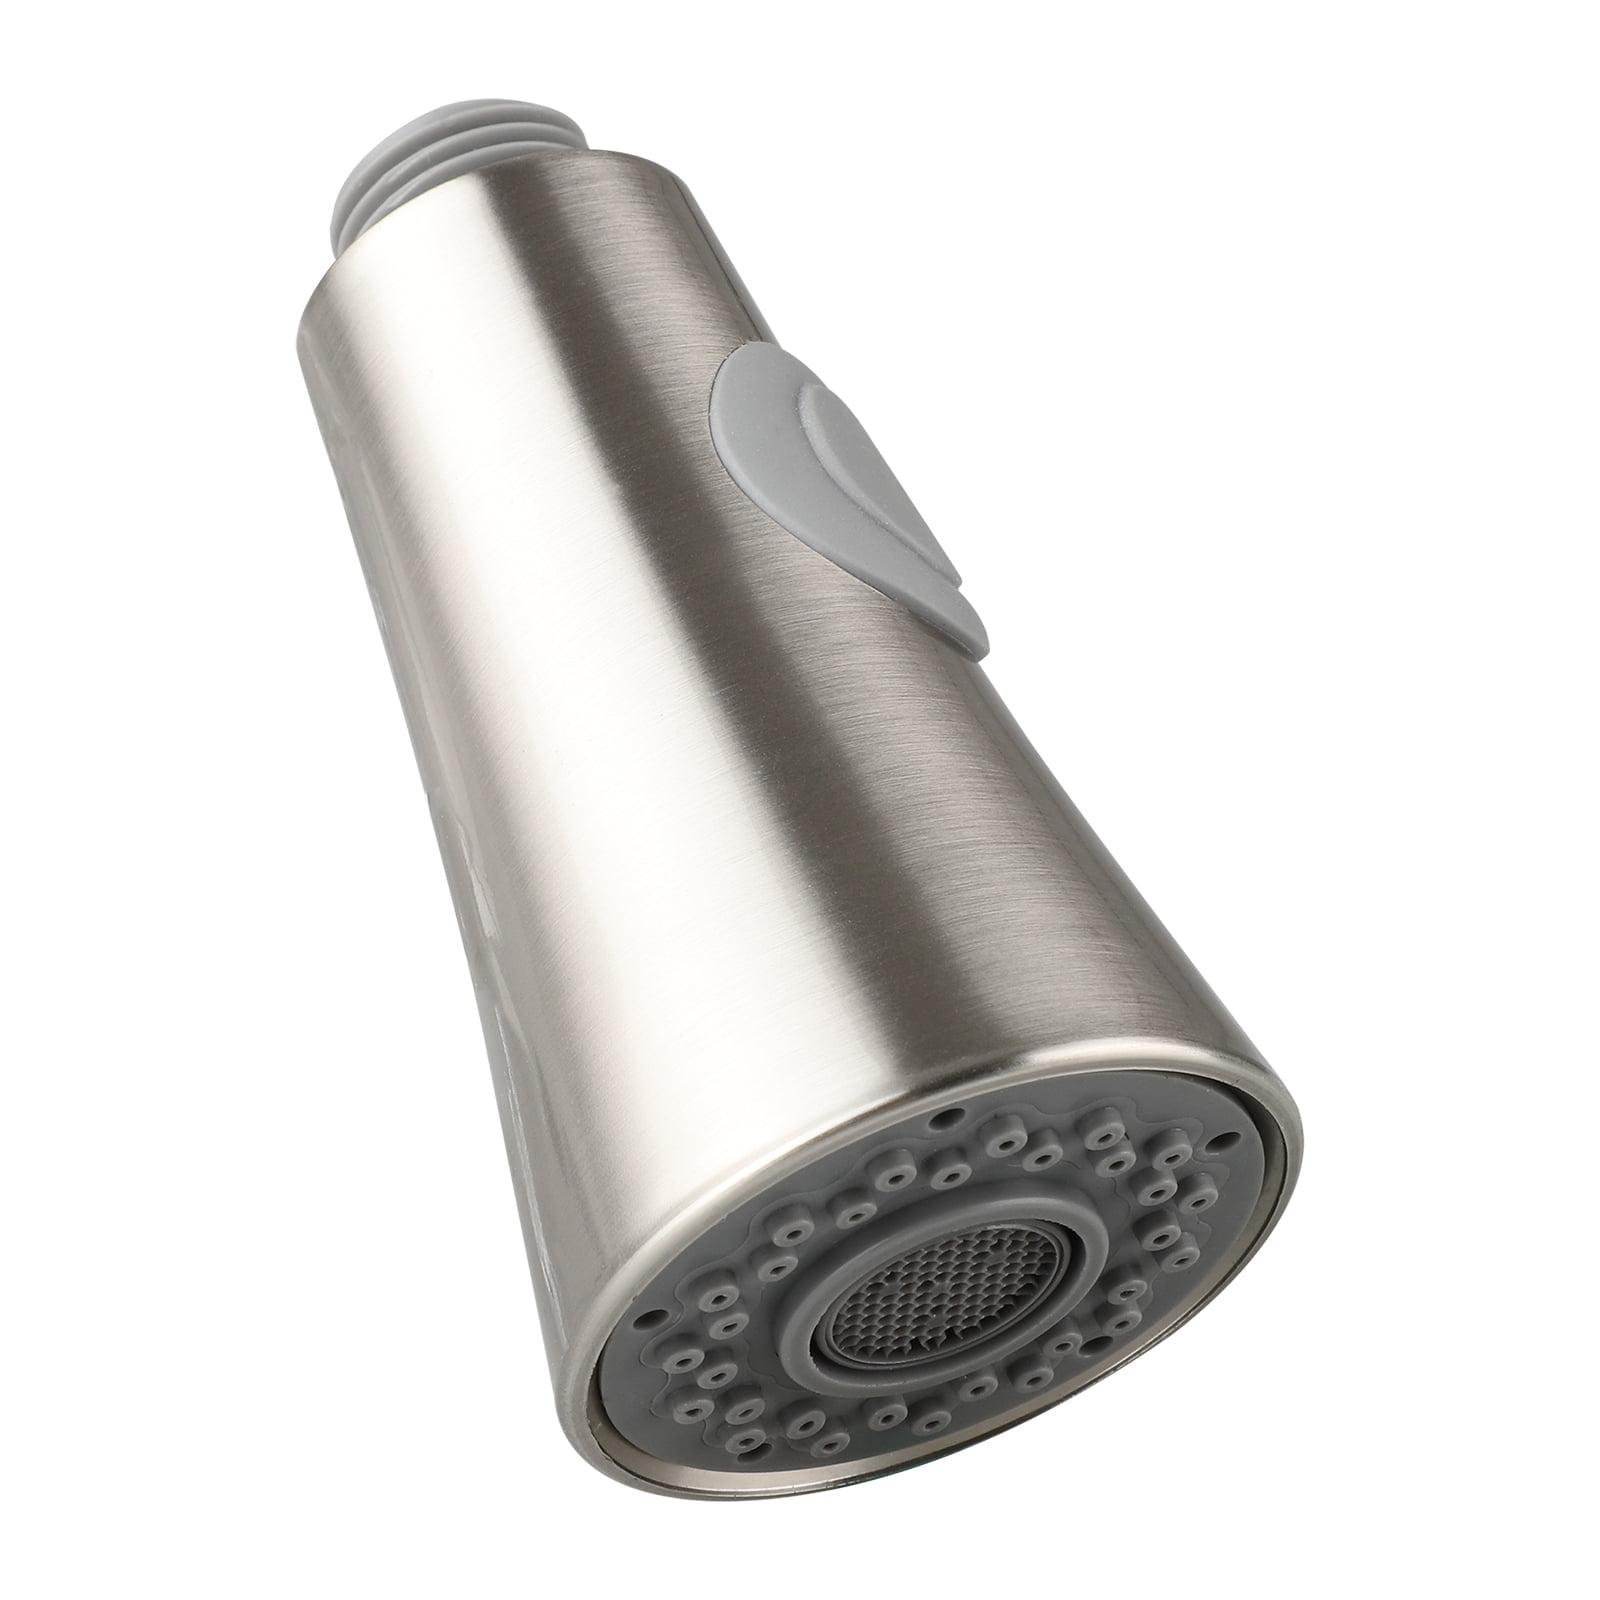 EEEKit Kitchen Faucet Sprayer Head Replacement Part, Pull ...